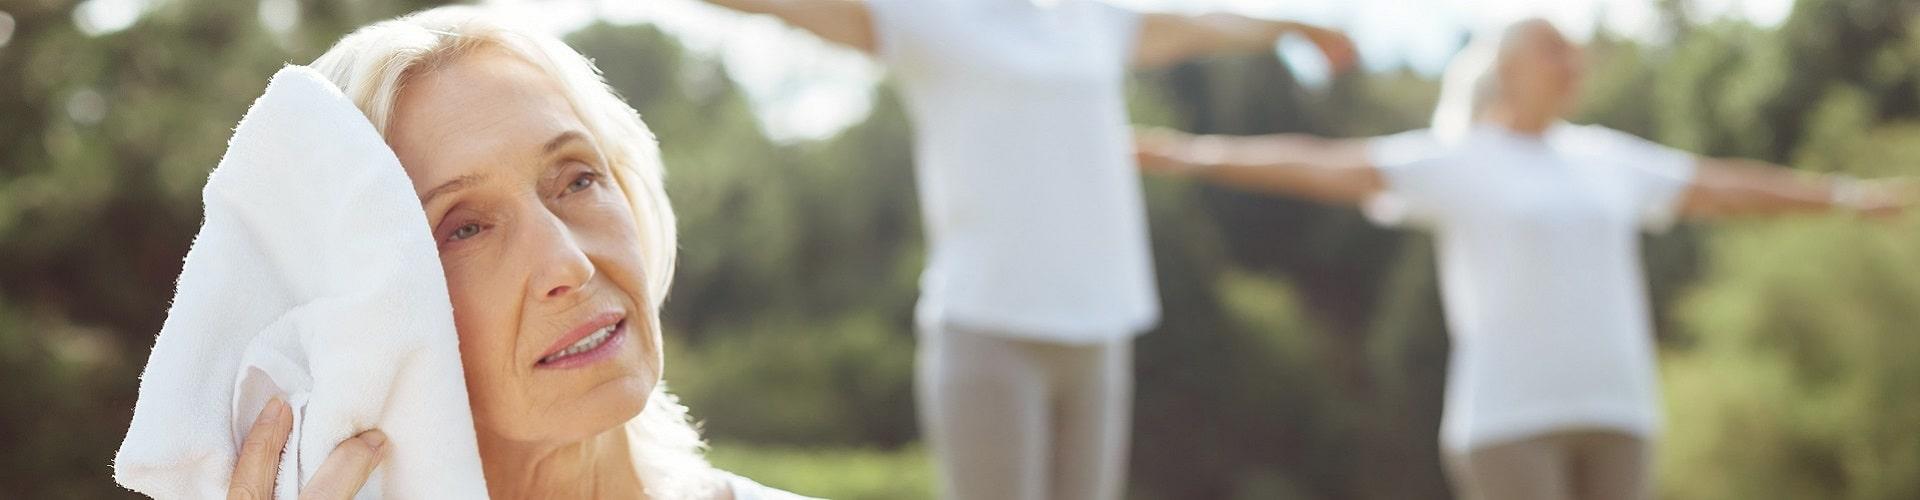 auriculothérapie-femme-serviette-oreille